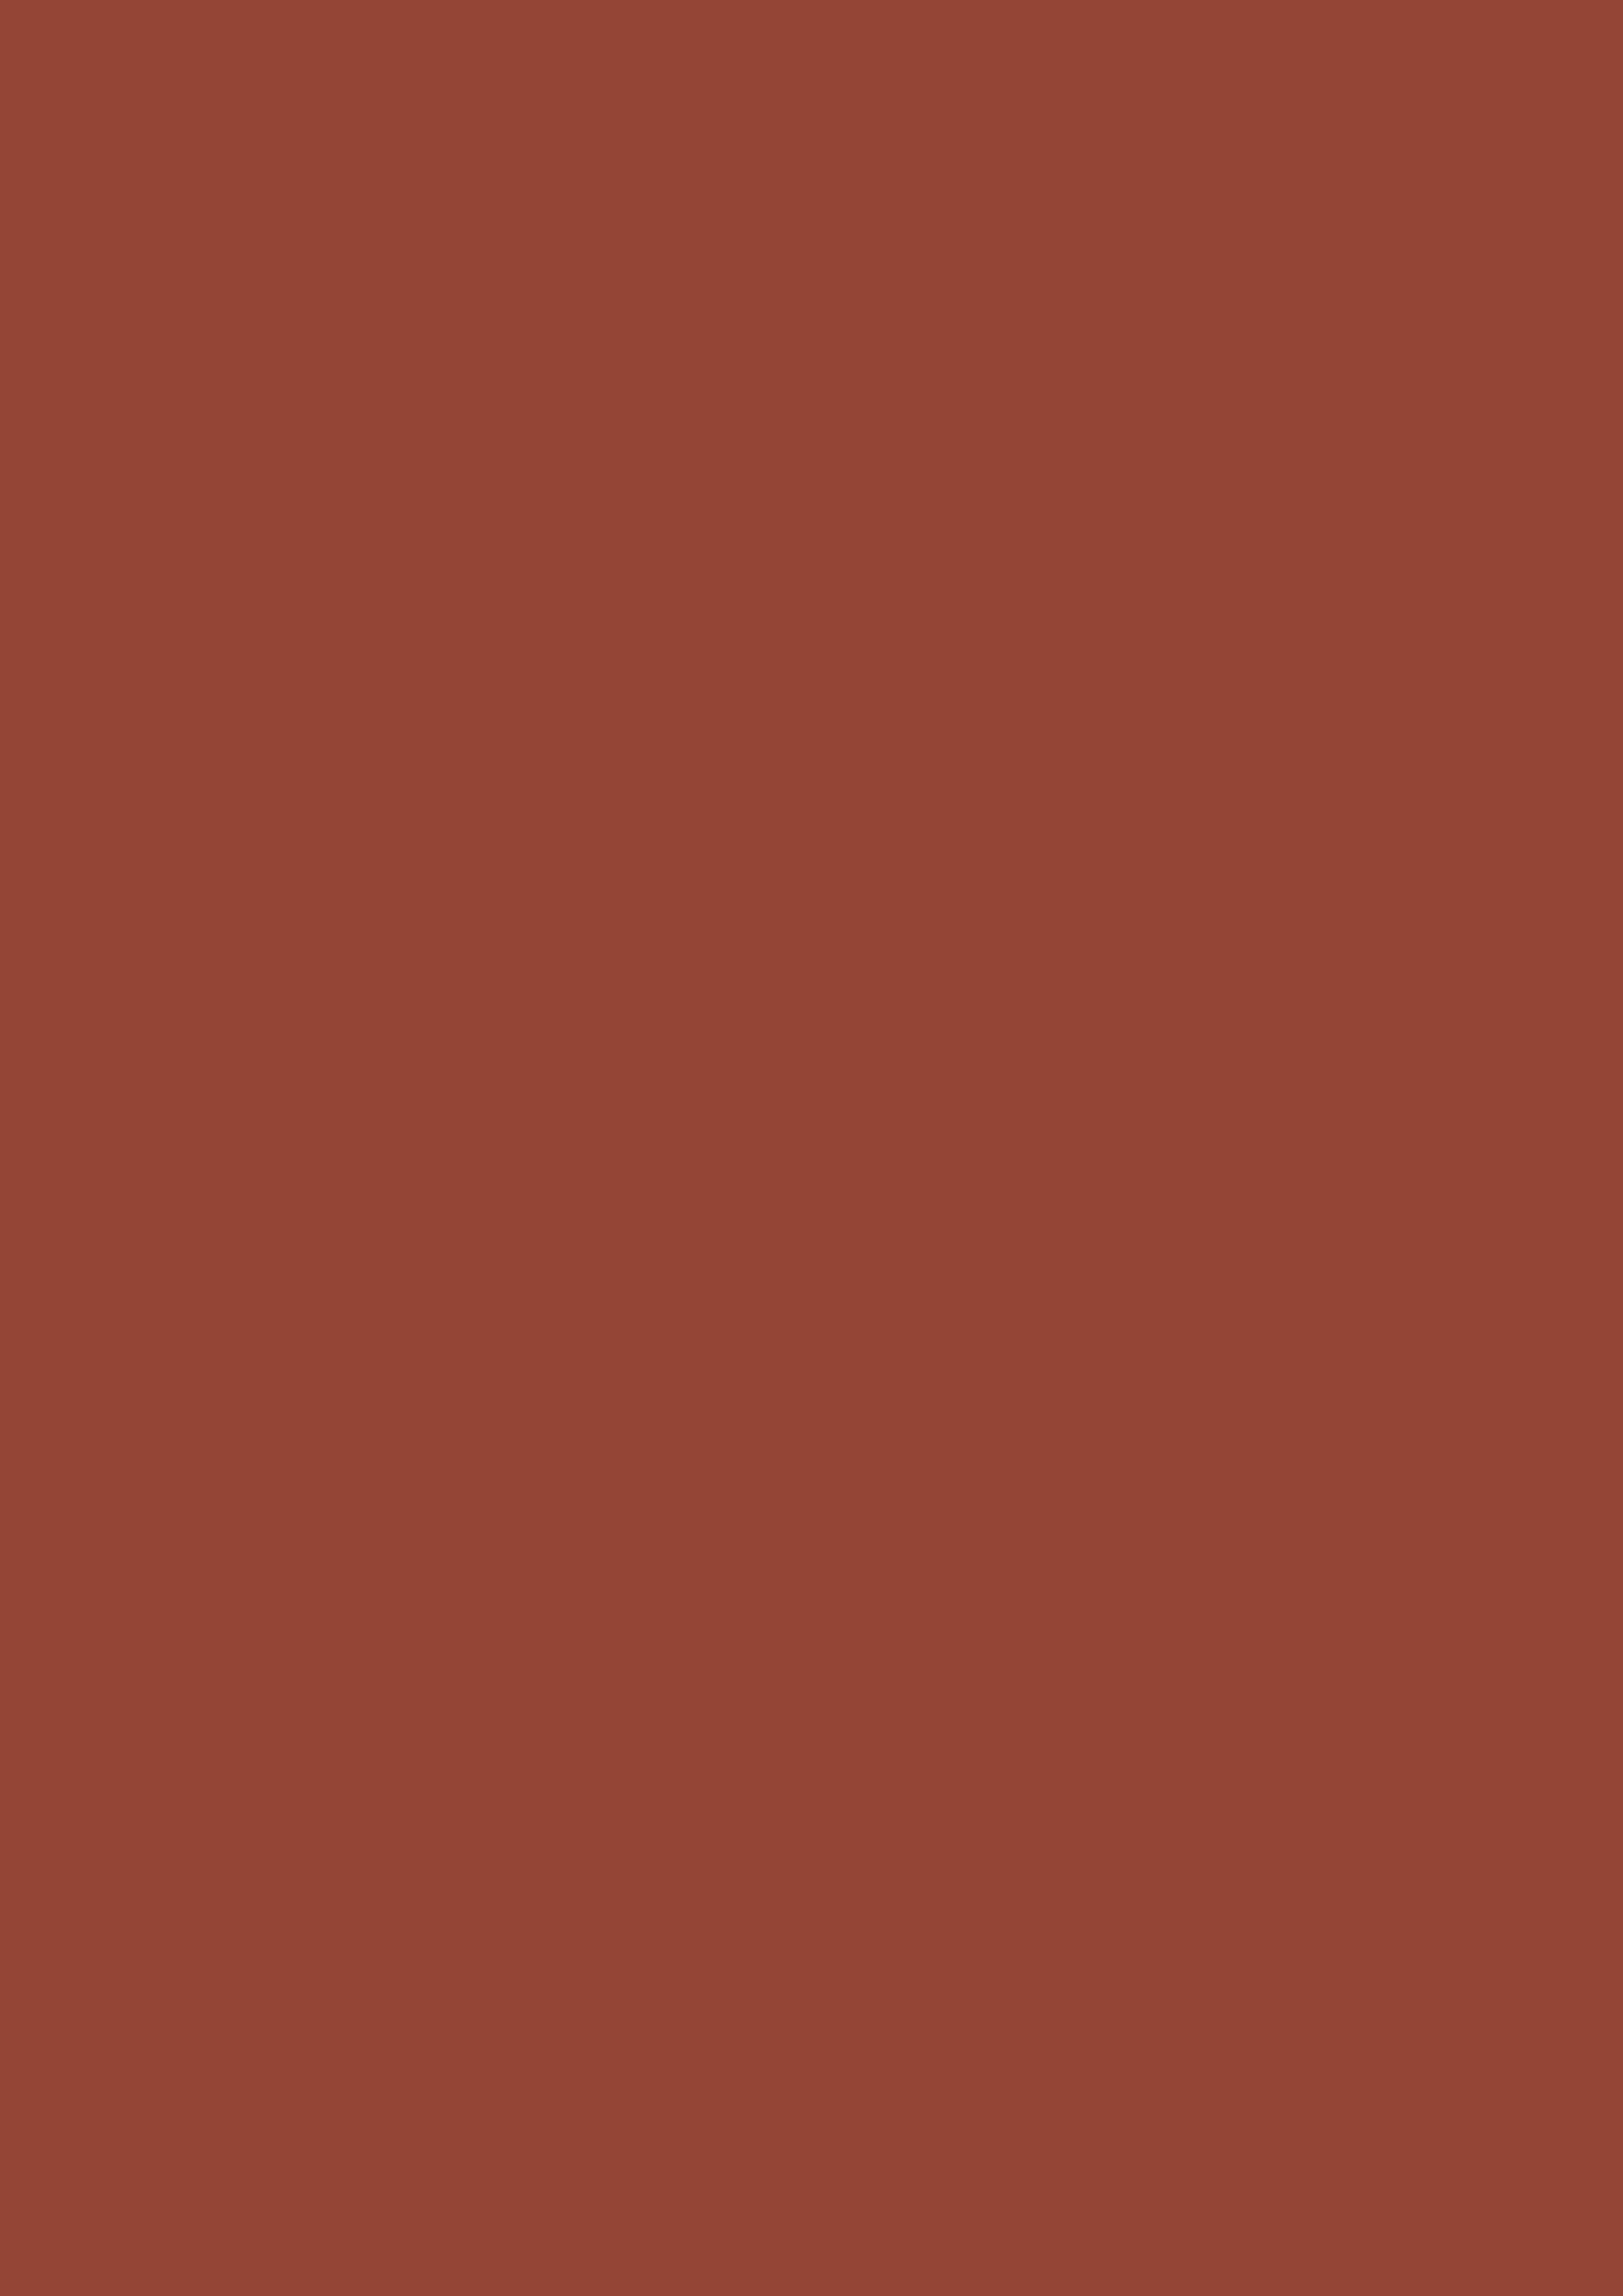 2480x3508 Chestnut Solid Color Background